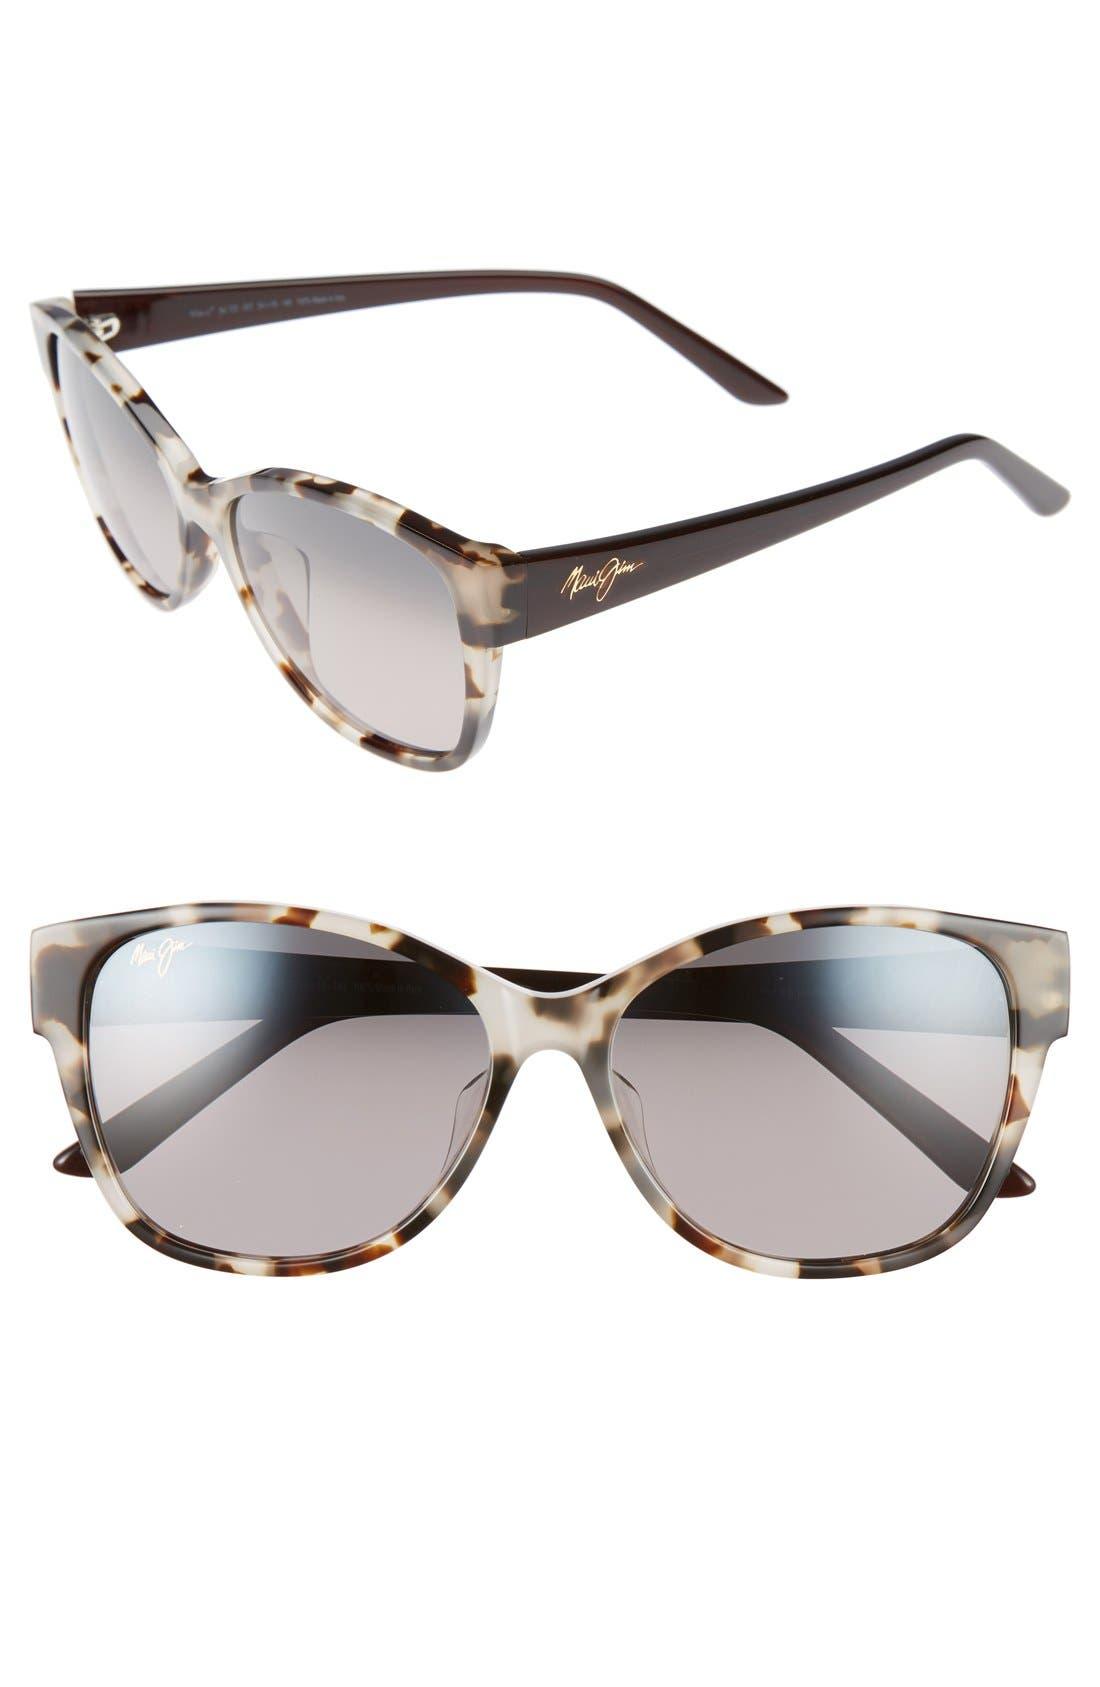 MAUI JIM, Summer Time 54mm PolarizedPlus2<sup>®</sup> Cat Eye Sunglasses, Main thumbnail 1, color, WHITE TOKYO TORTOISE/ GREY